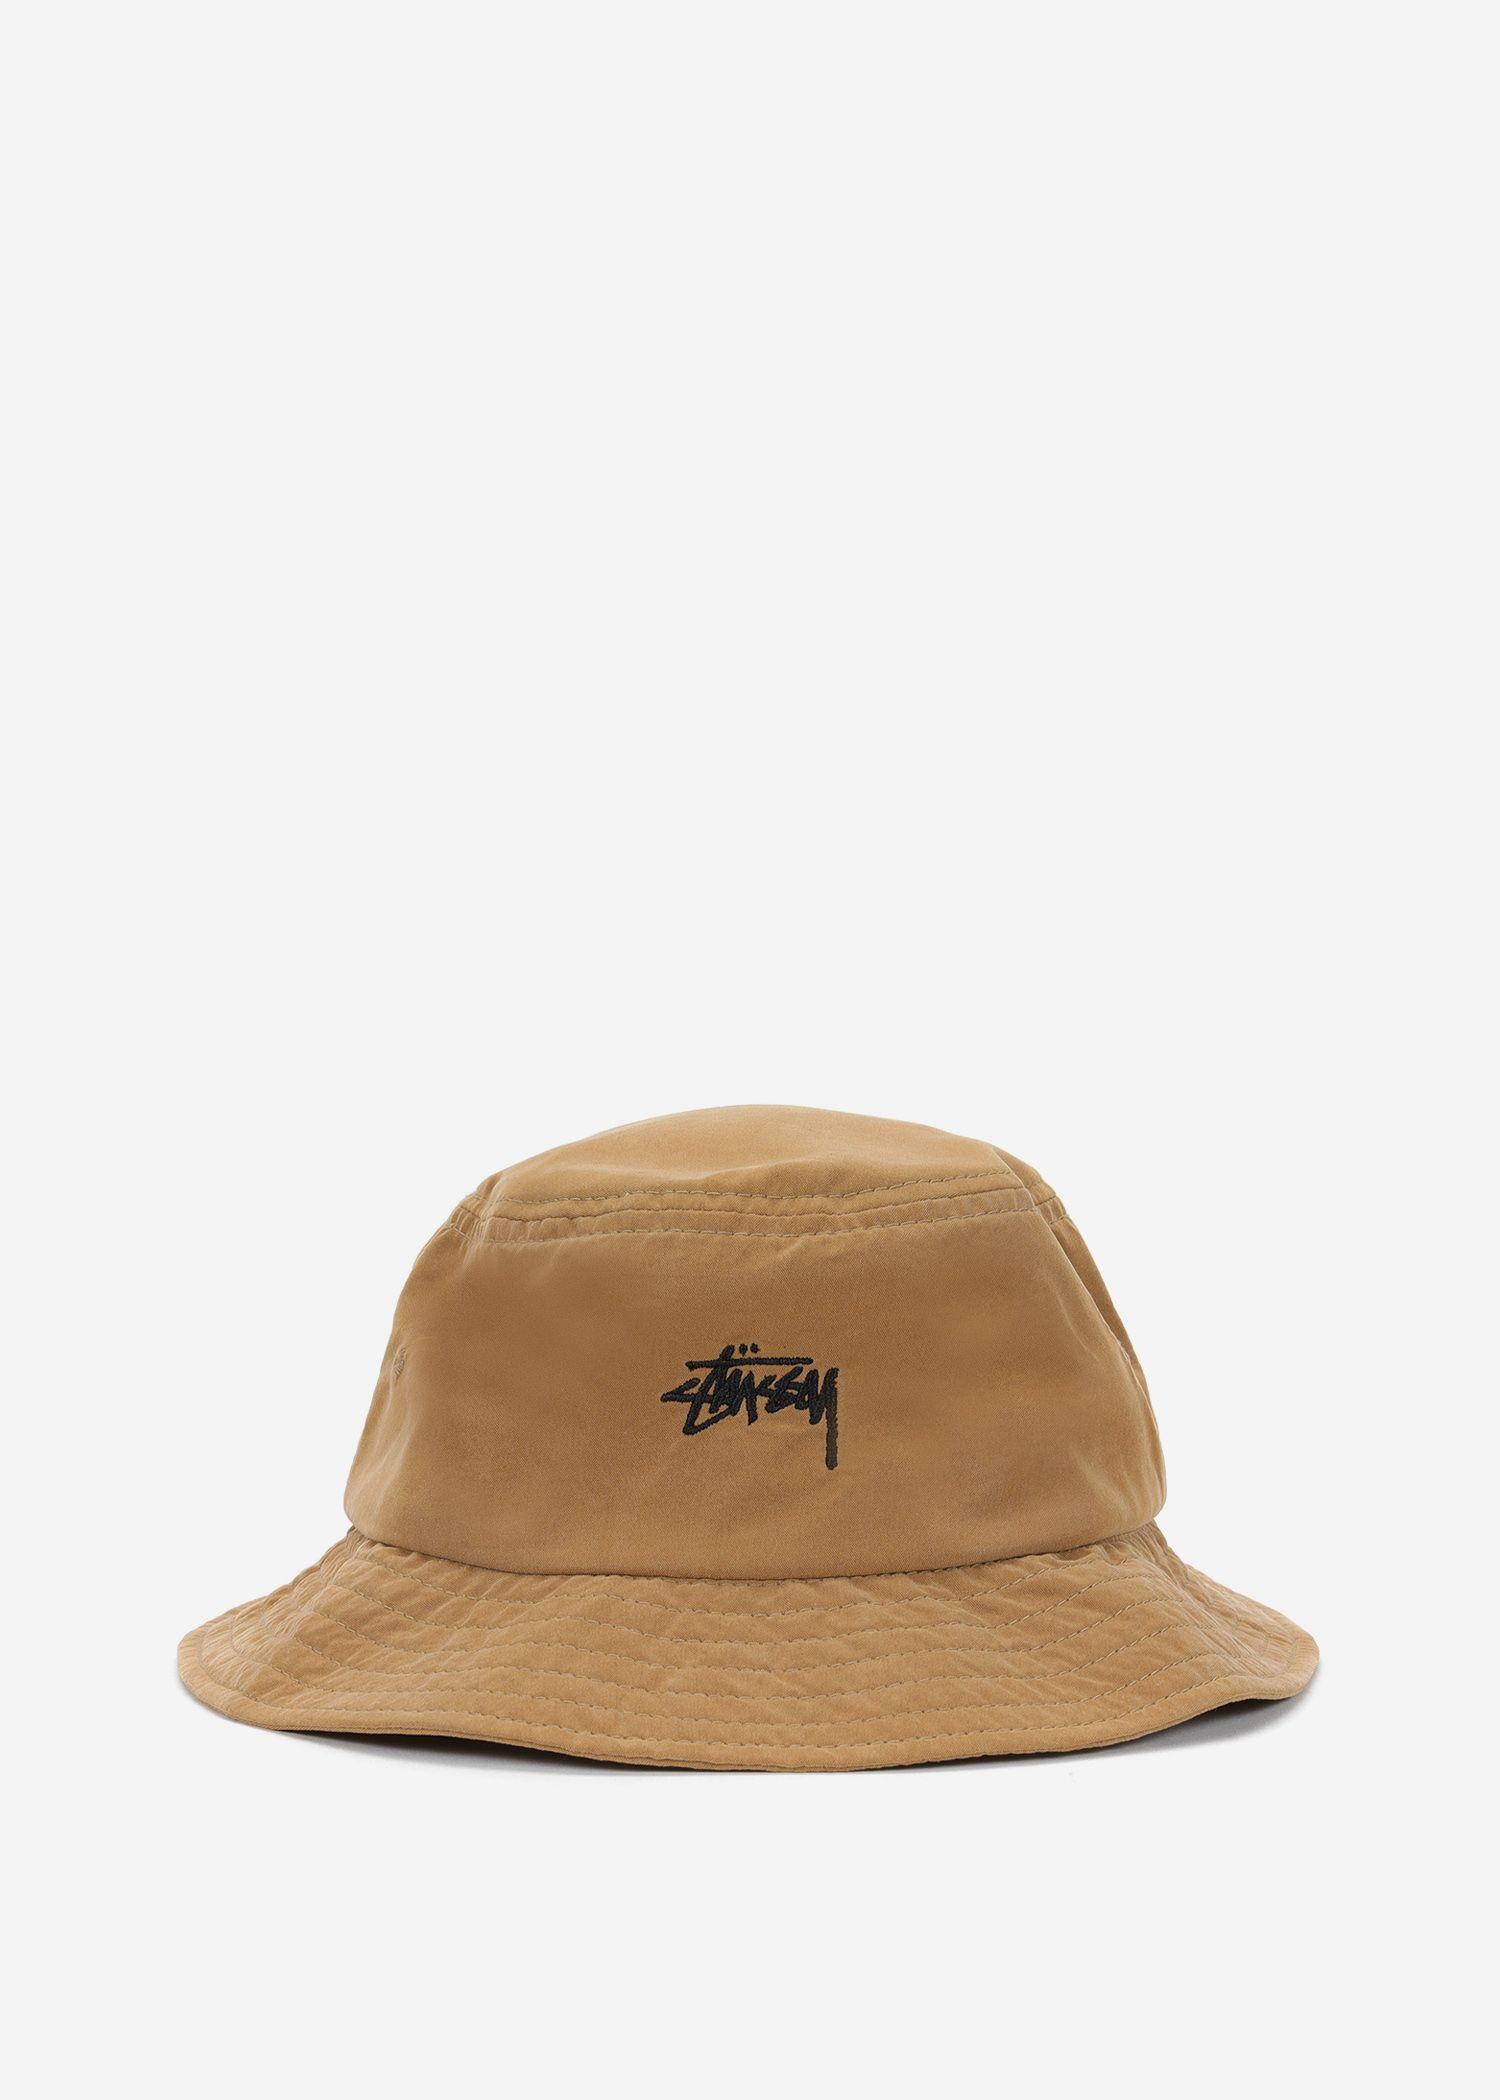 a73b4d91945 STUSSY STOCK BUCKET HAT.  stussy